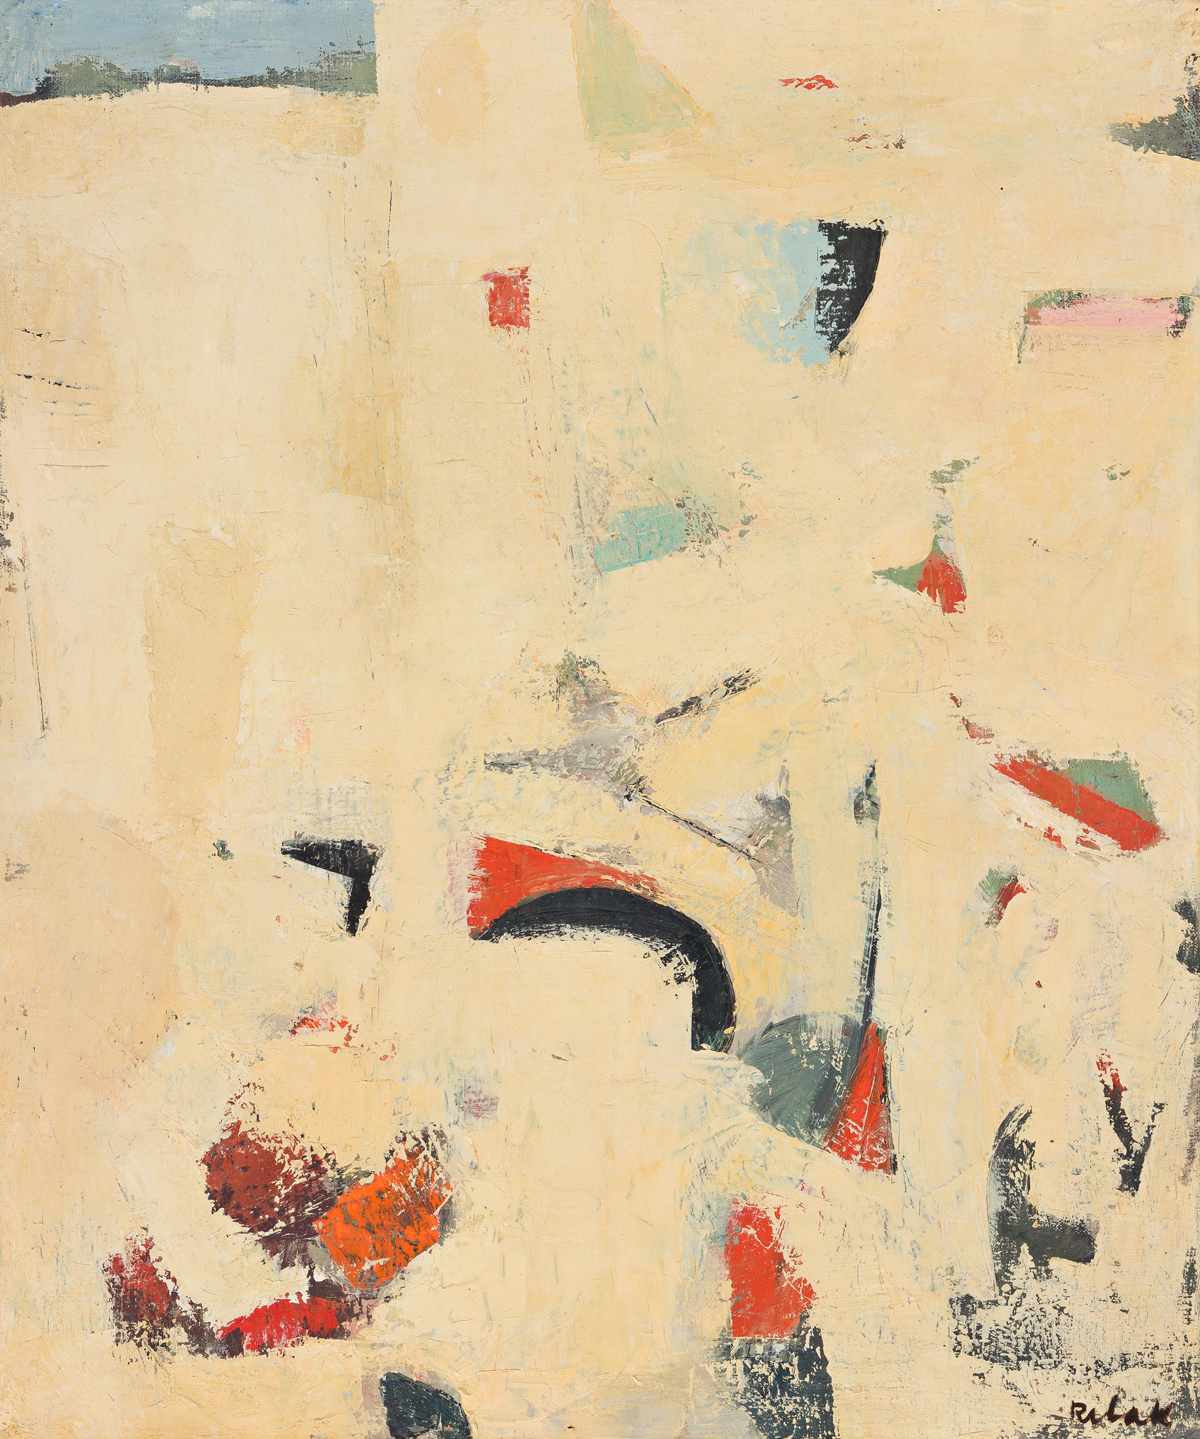 LOUIS RIBAK (1902 - 1979, LITHUANIAN/AMERICAN) Untitled, (No. 9)